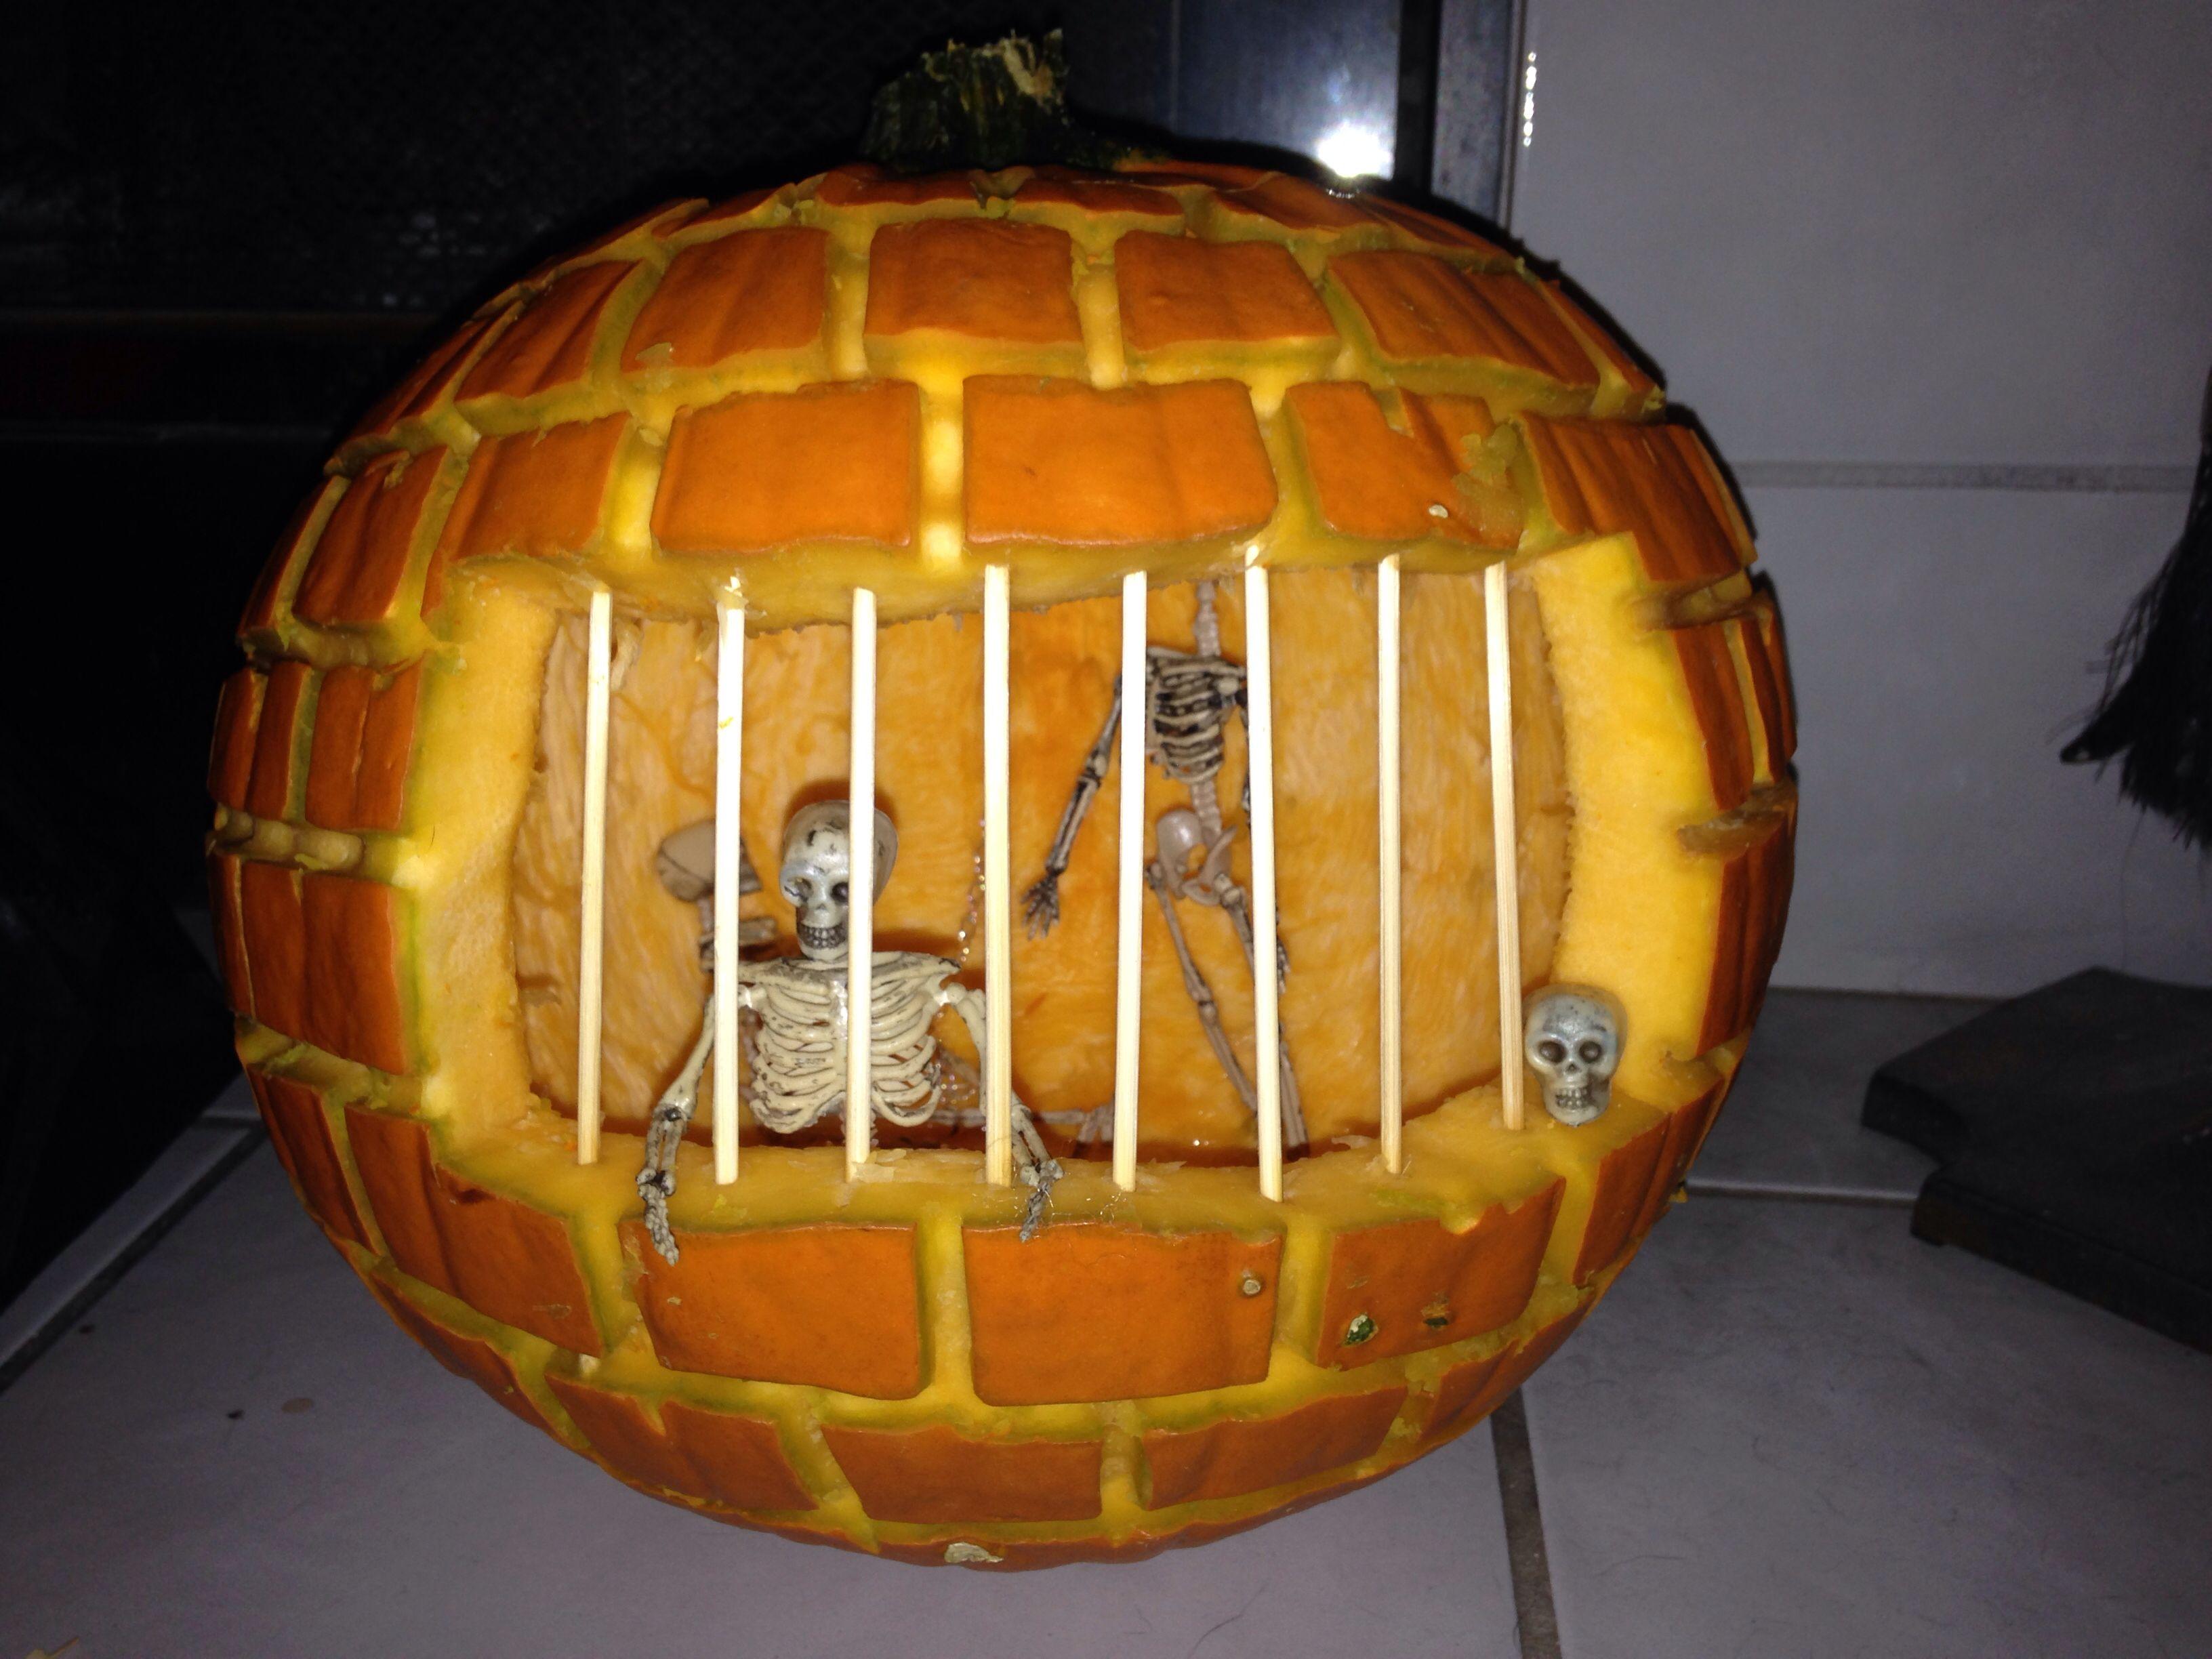 Pumpkin carving - Skeleton jailhouse | Pumpkins! | Pinterest ...